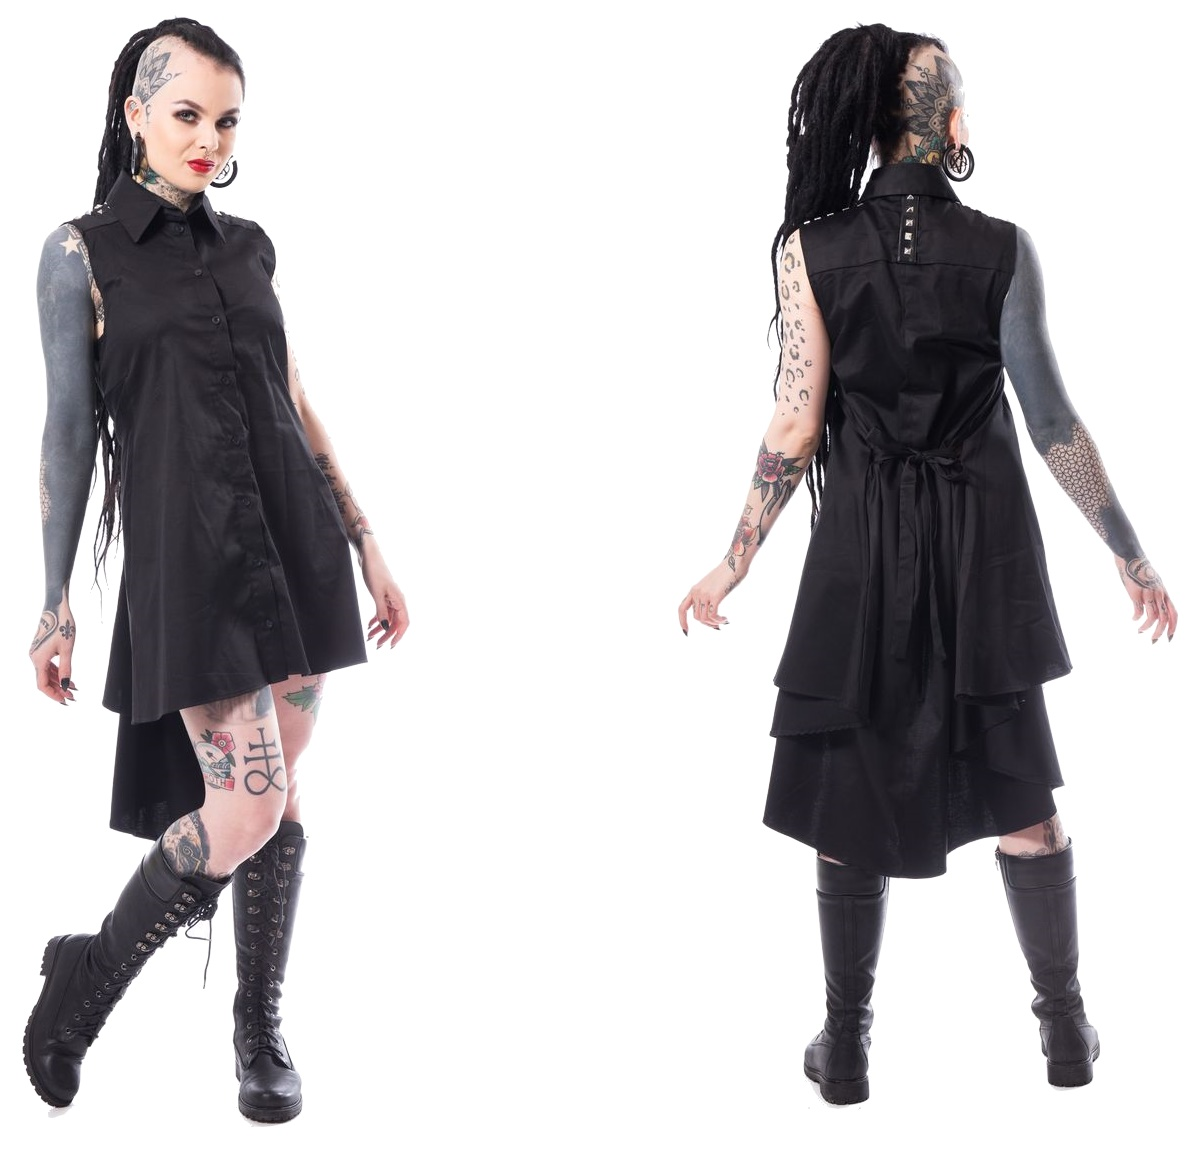 32bdbdbca87c92 After Death Mini Dress Tunika Spin Doctor Plussize in XL - Spin ...